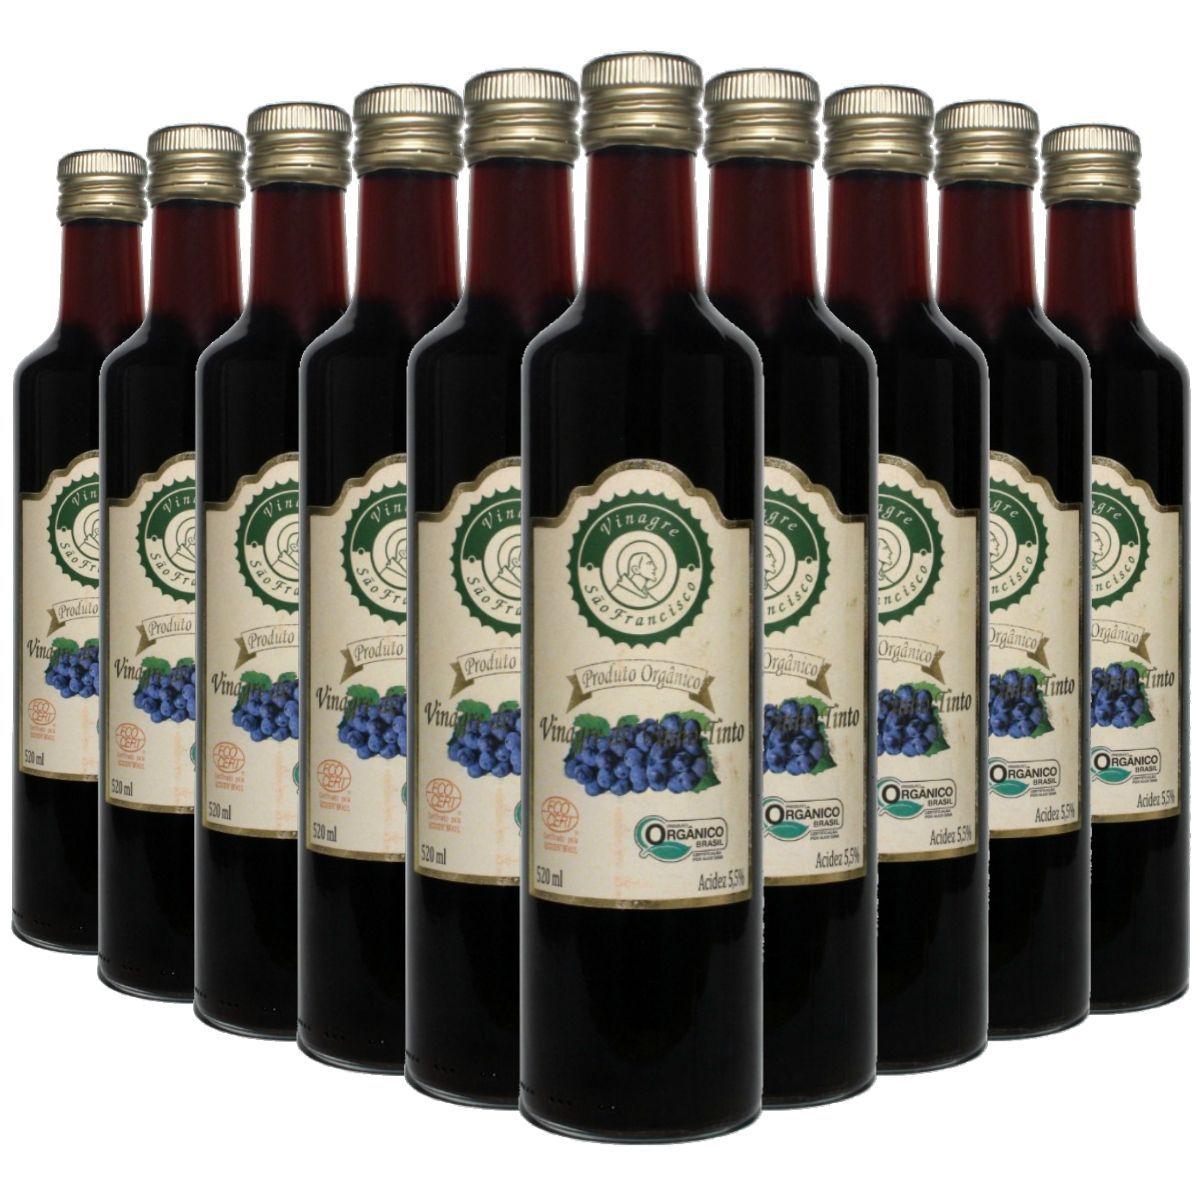 Kit 10 Vinagre Orgânico São Francisco Vinho Tinto Acidez 5,5% - 500ml